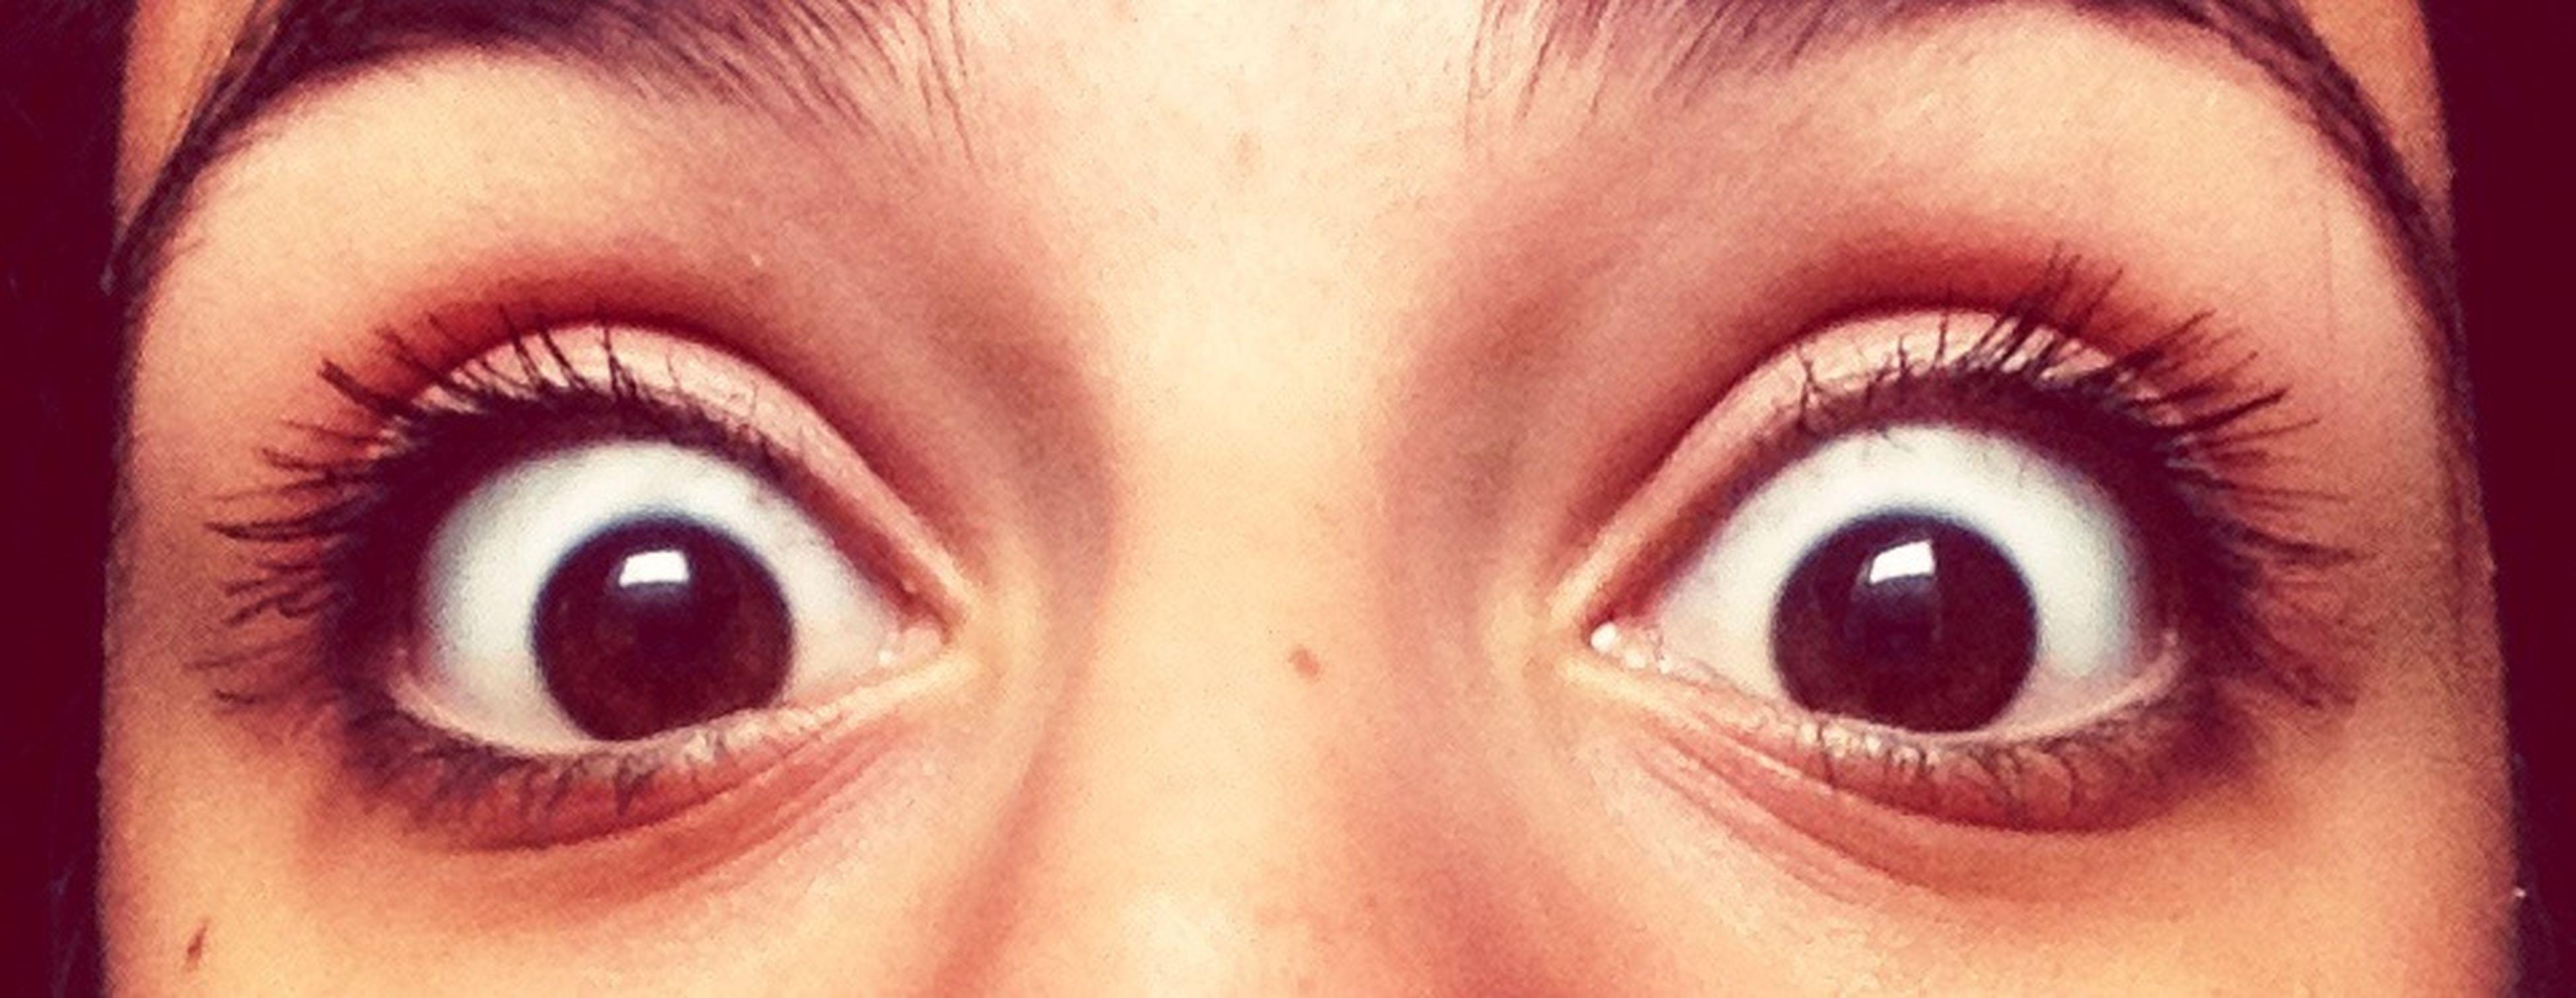 human eye, close-up, eyelash, looking at camera, portrait, sensory perception, eyesight, human face, part of, human skin, lifestyles, headshot, extreme close-up, young adult, iris - eye, front view, full frame